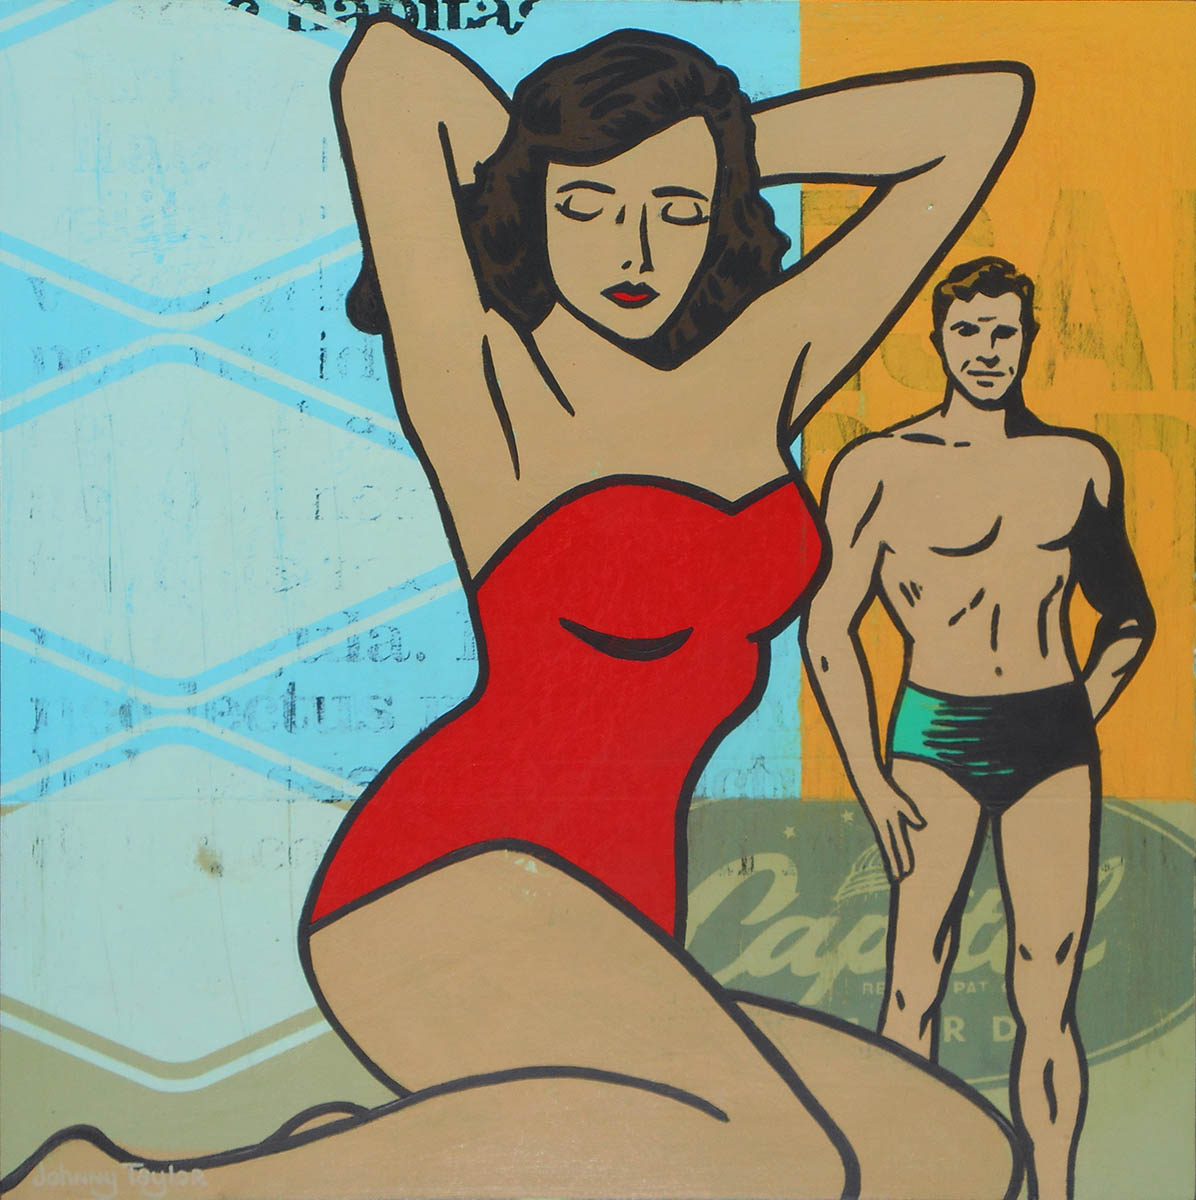 Retro beach pop art